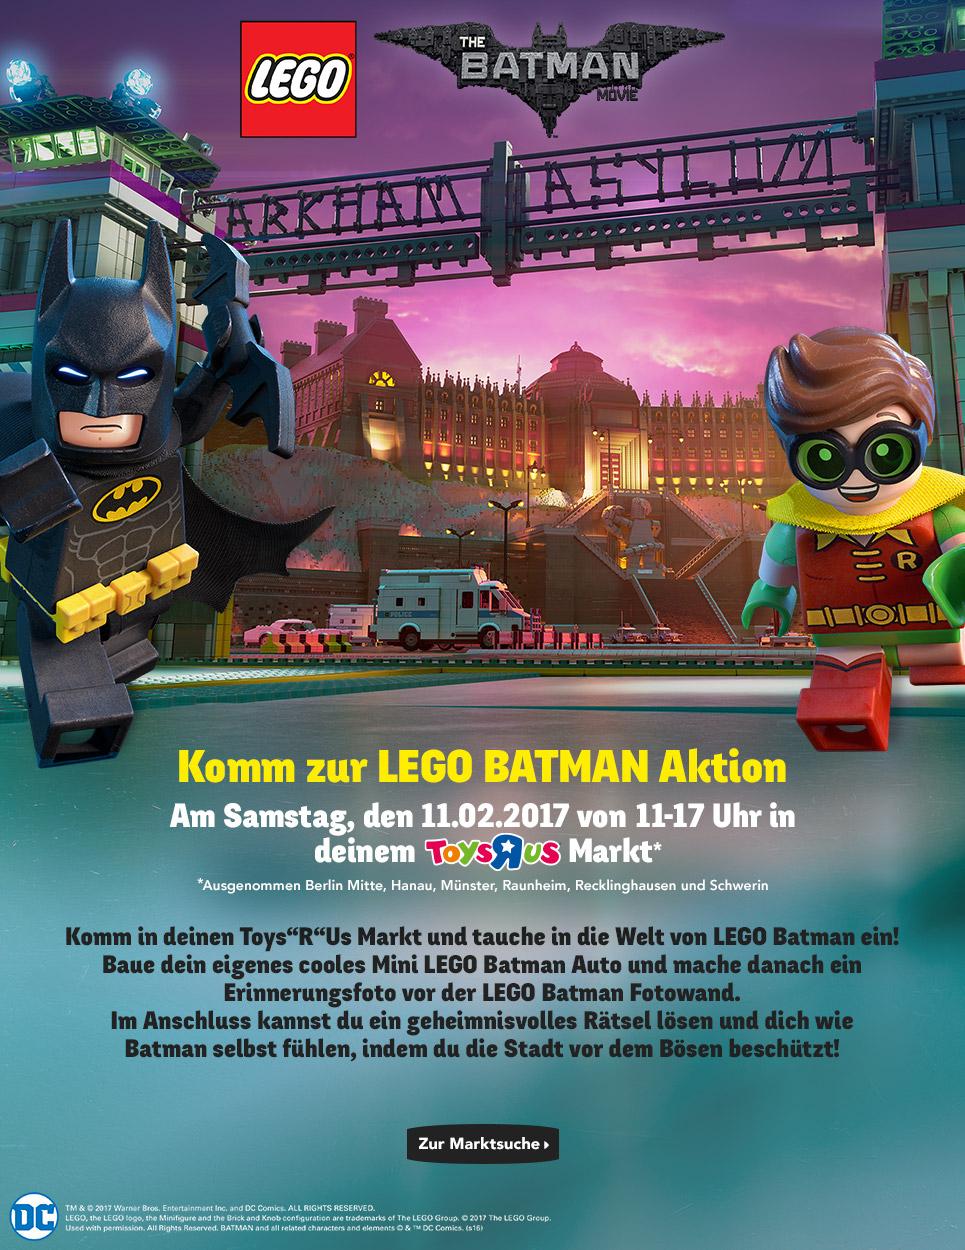 [Toys r us] Lego Batman Auto zum selber bauen